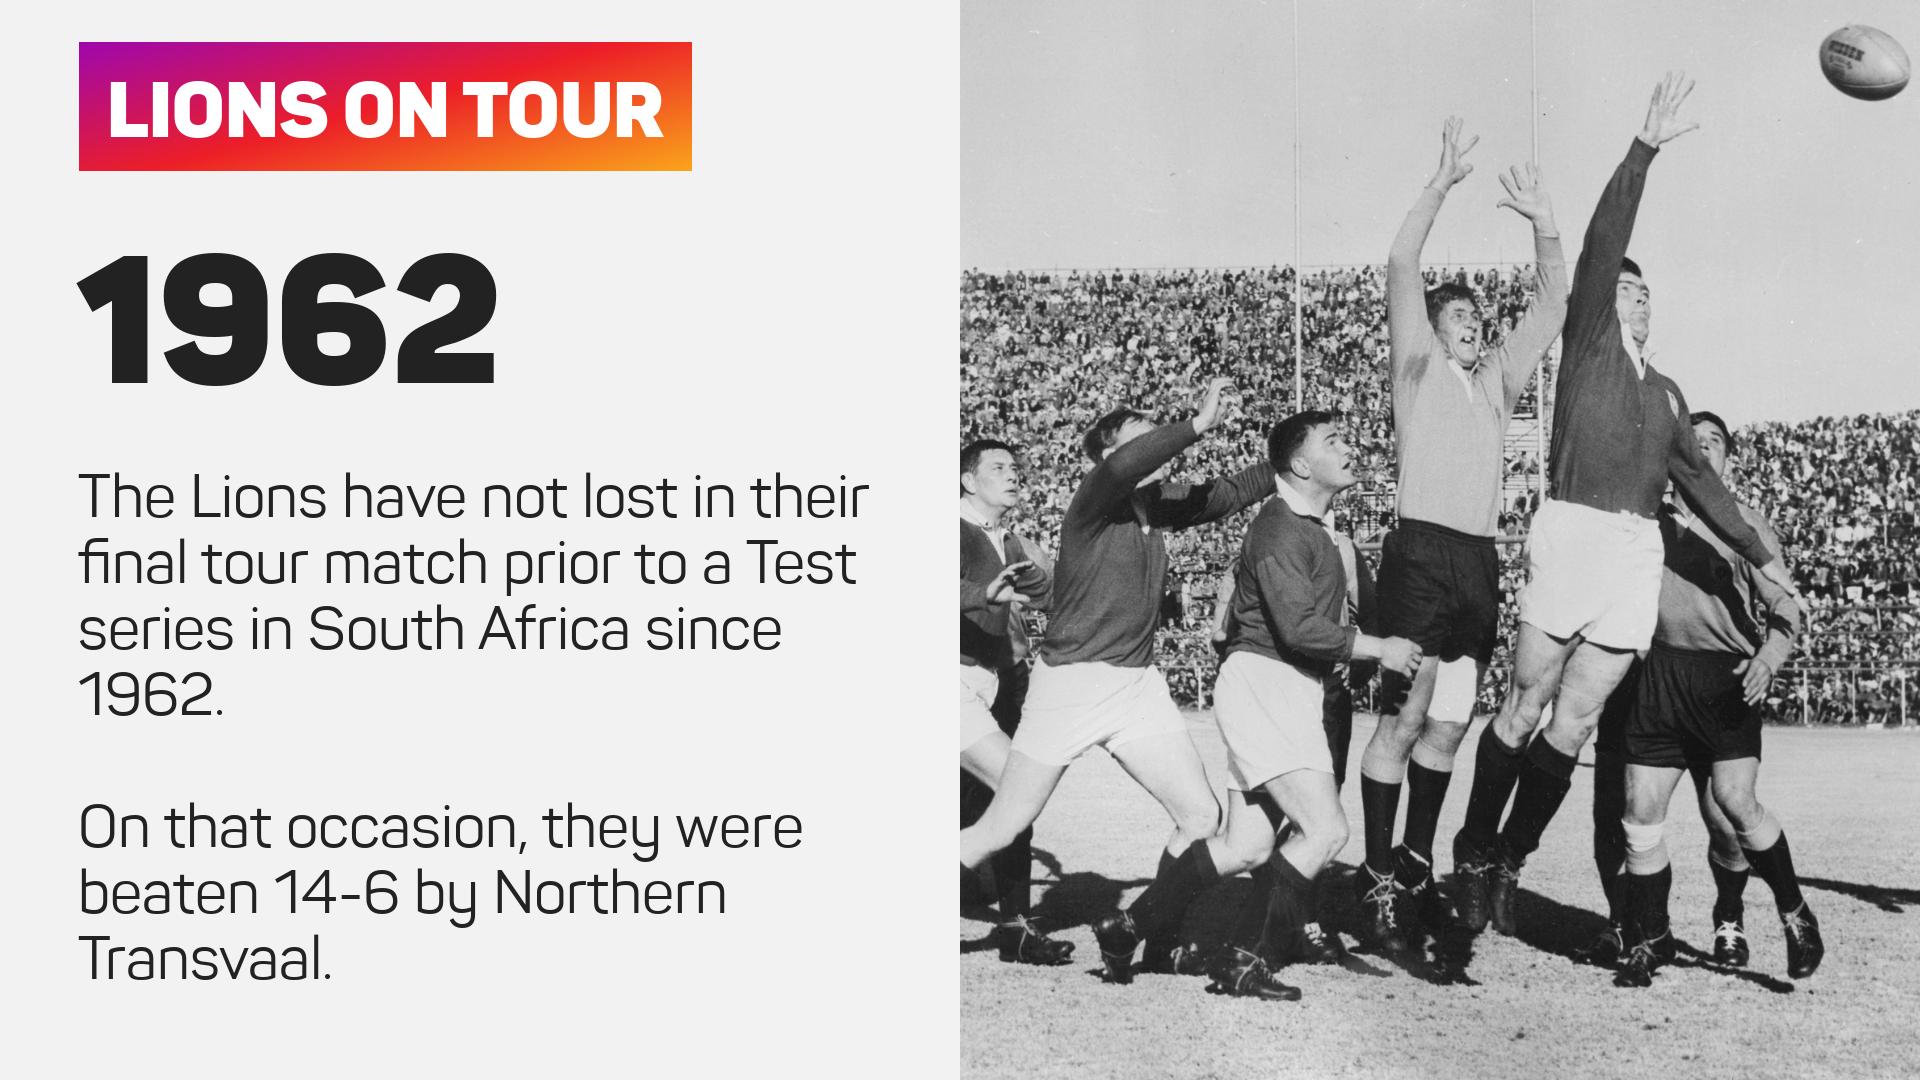 British and Irish Lions 1962 defeat